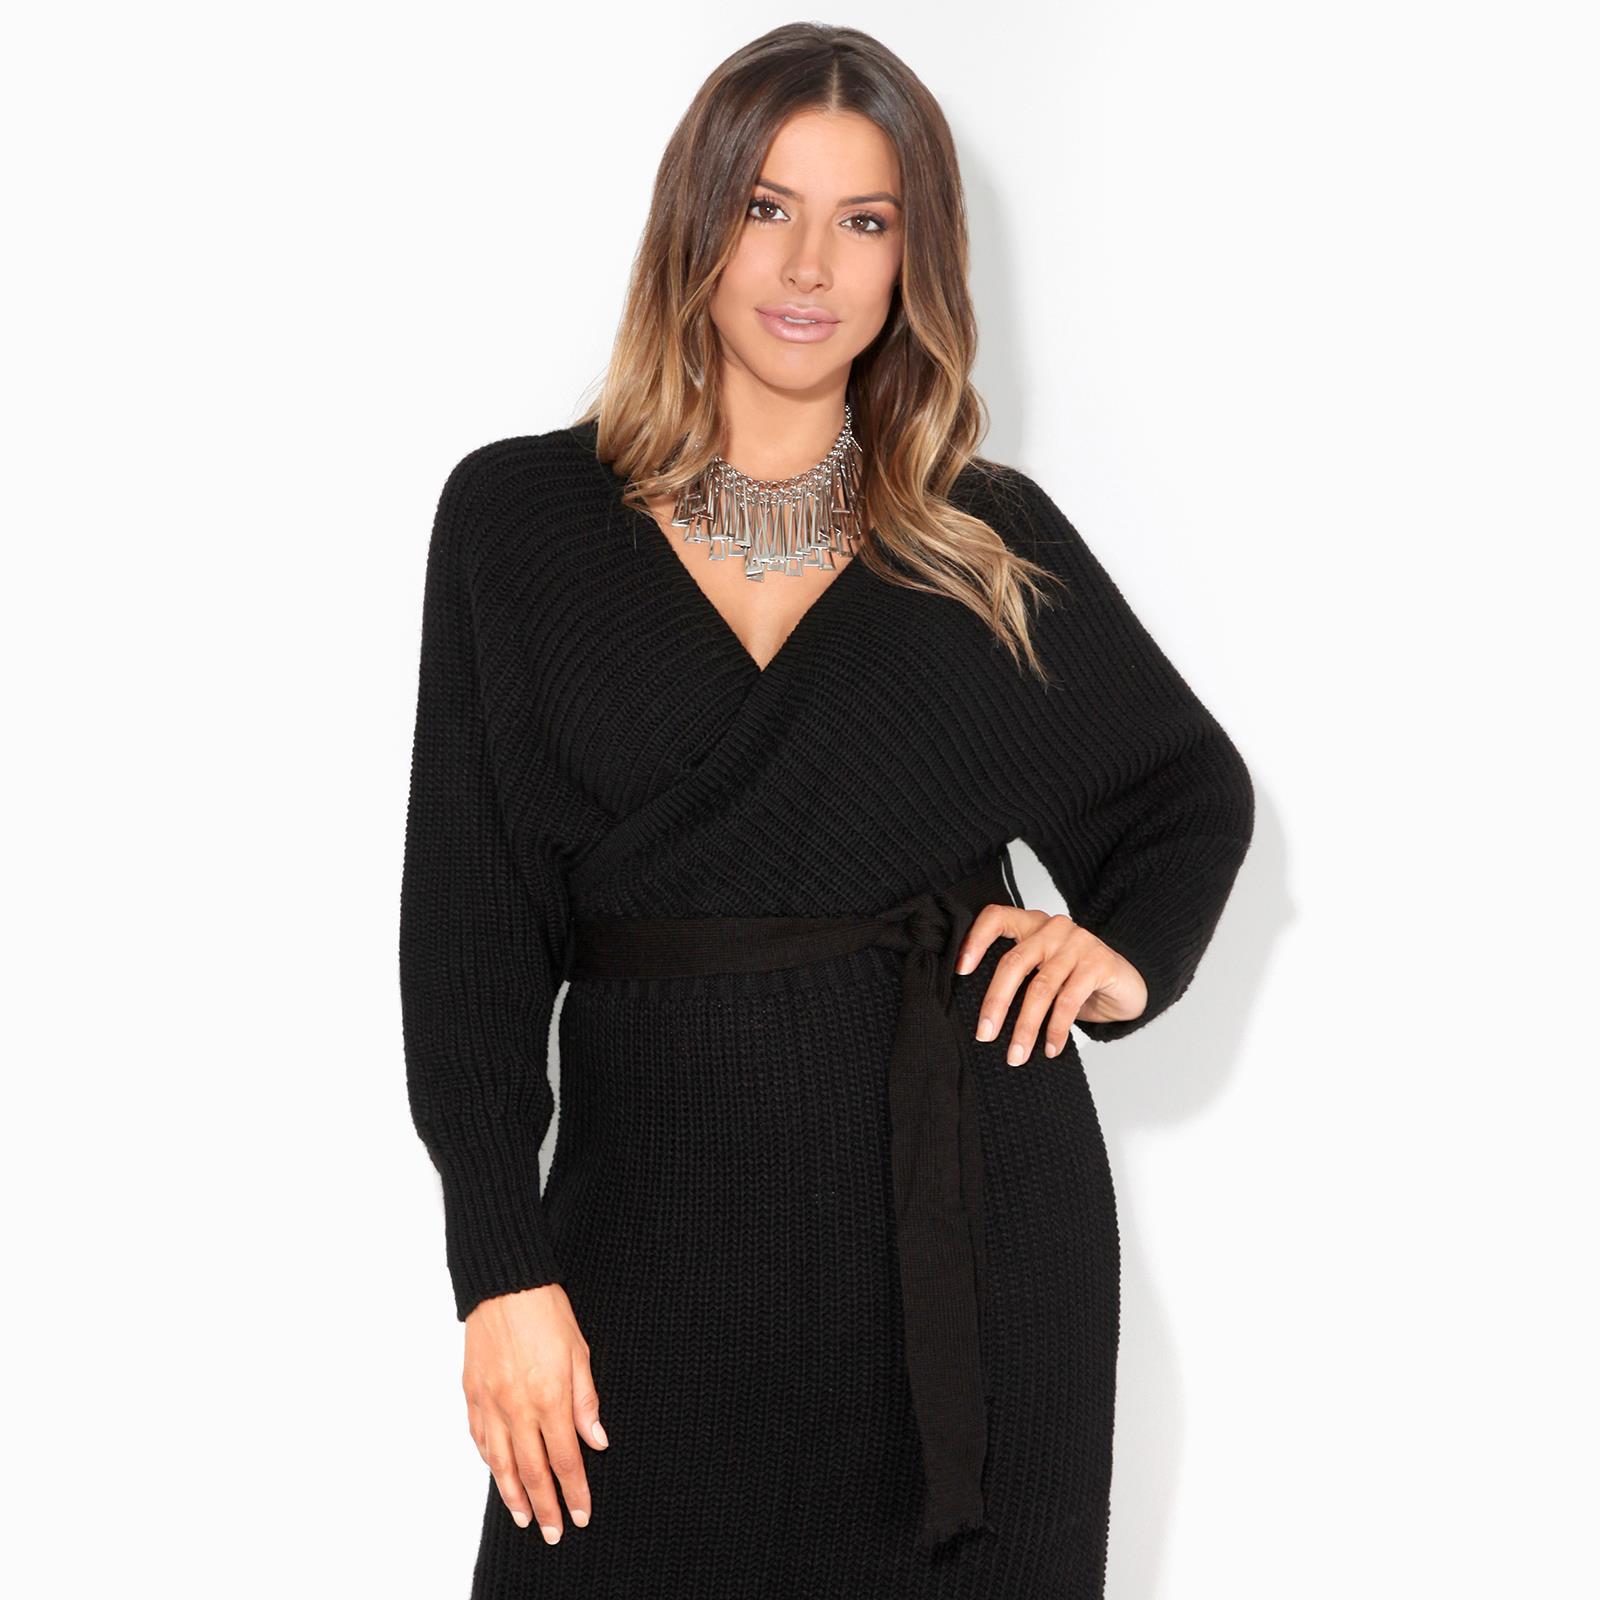 Womens-Ladies-Jumper-Dress-Chunky-Knit-Wrap-V-Neck-Maxi-Long-Sleeve-Winter-Top thumbnail 3